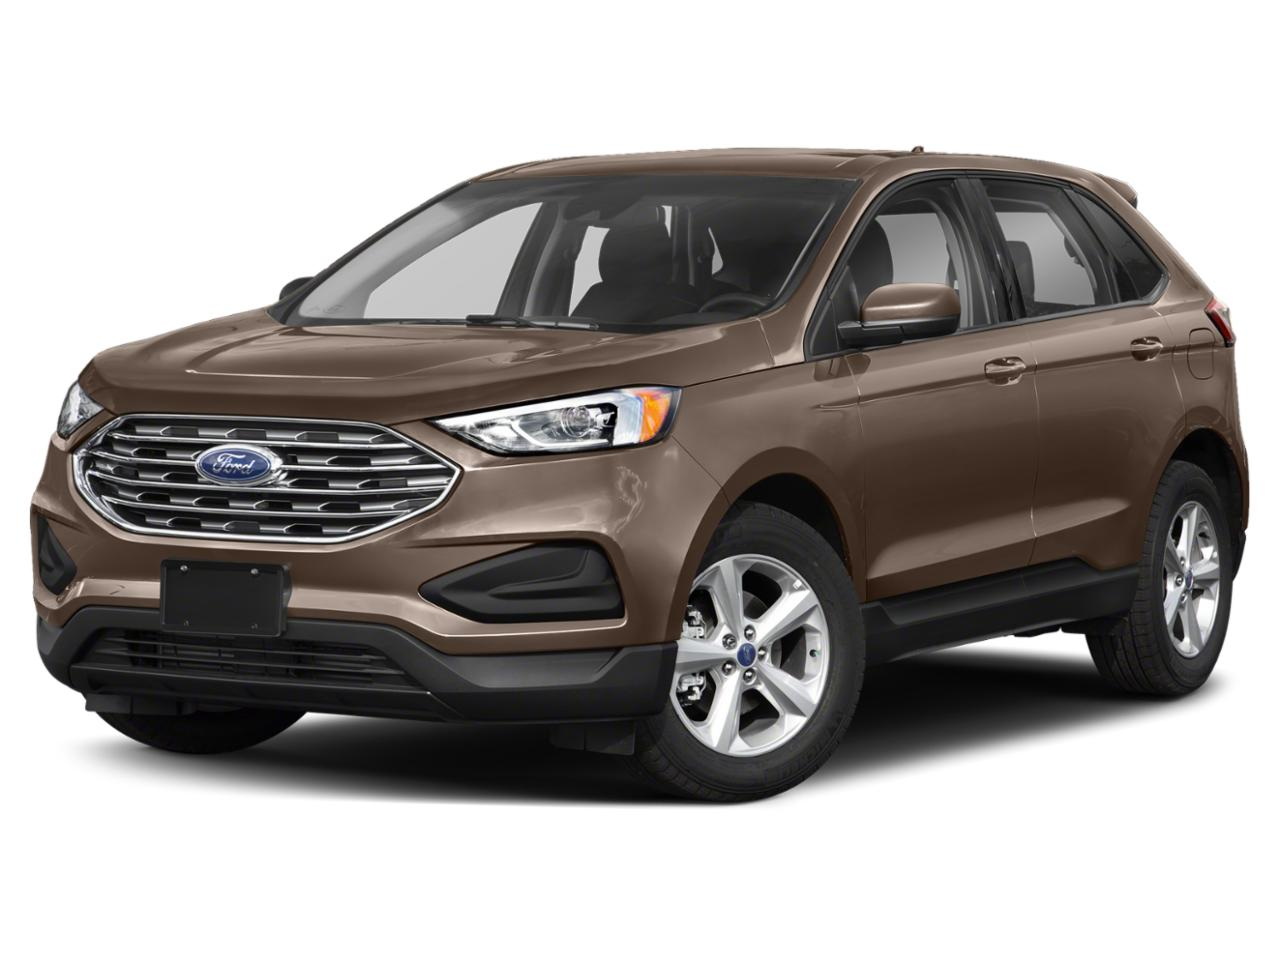 2019 Ford Edge Vehicle Photo in Neenah, WI 54956